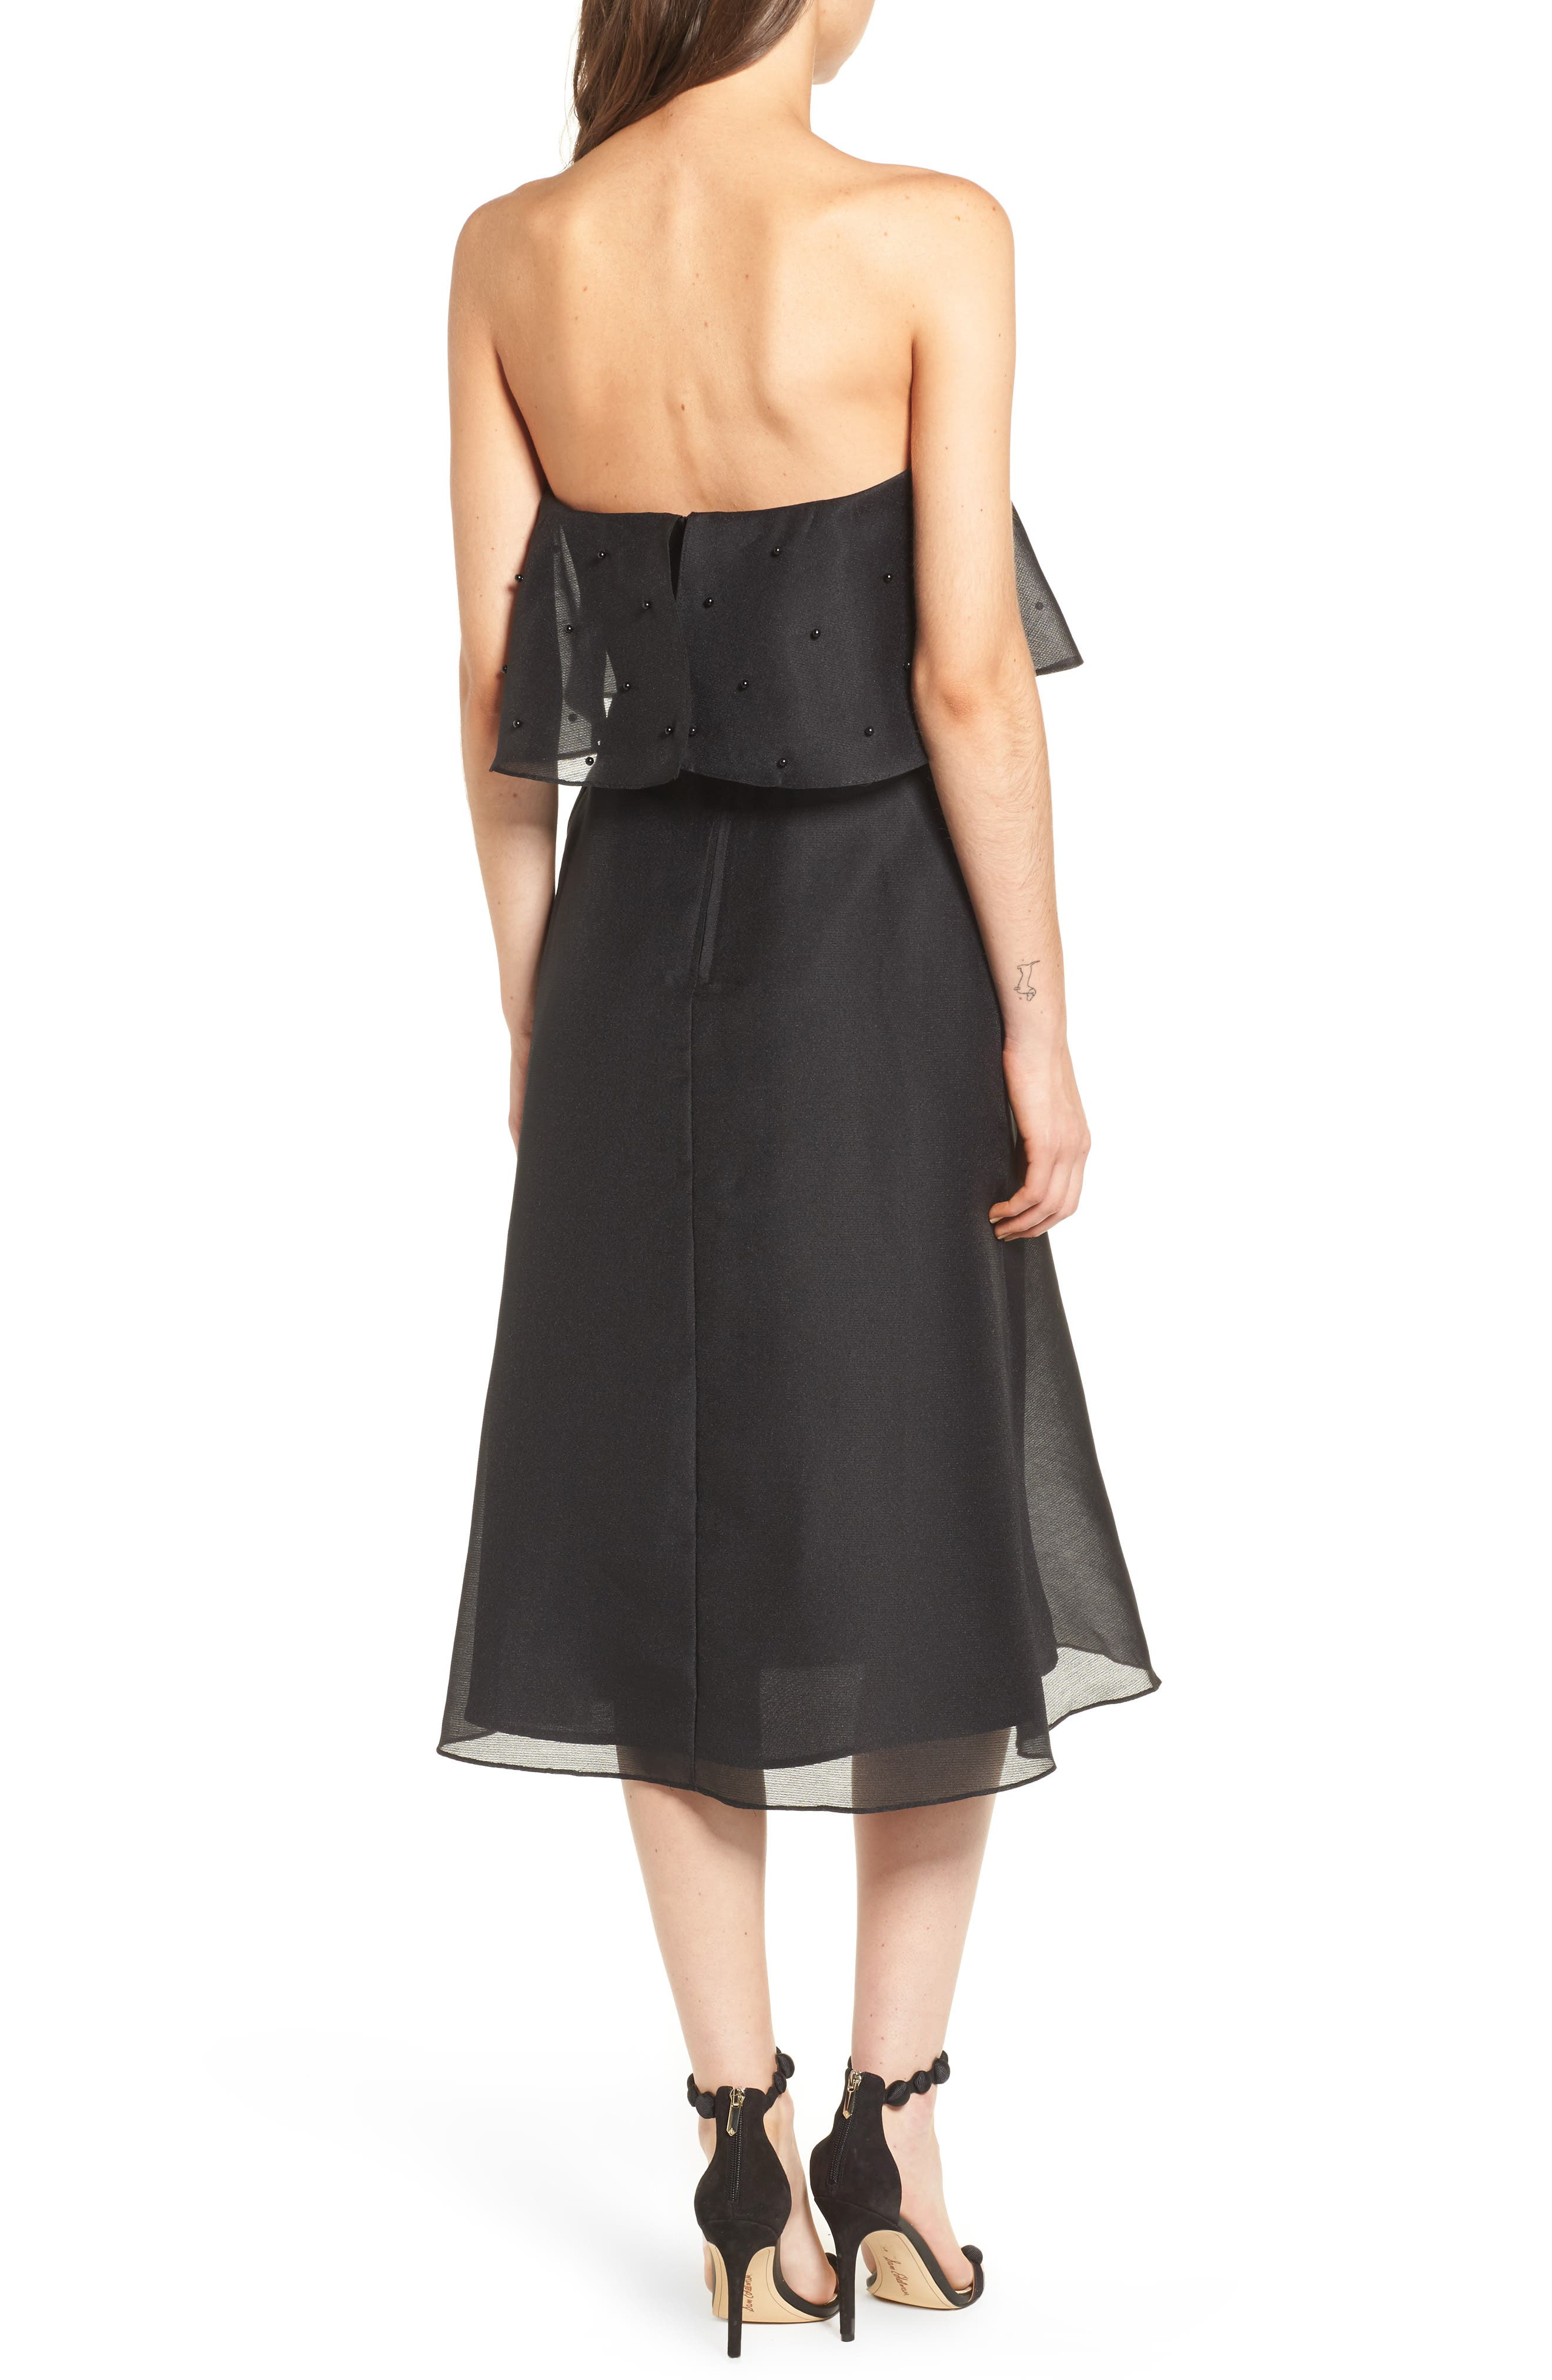 Call Me Strapless Dress,                             Alternate thumbnail 3, color,                             Black